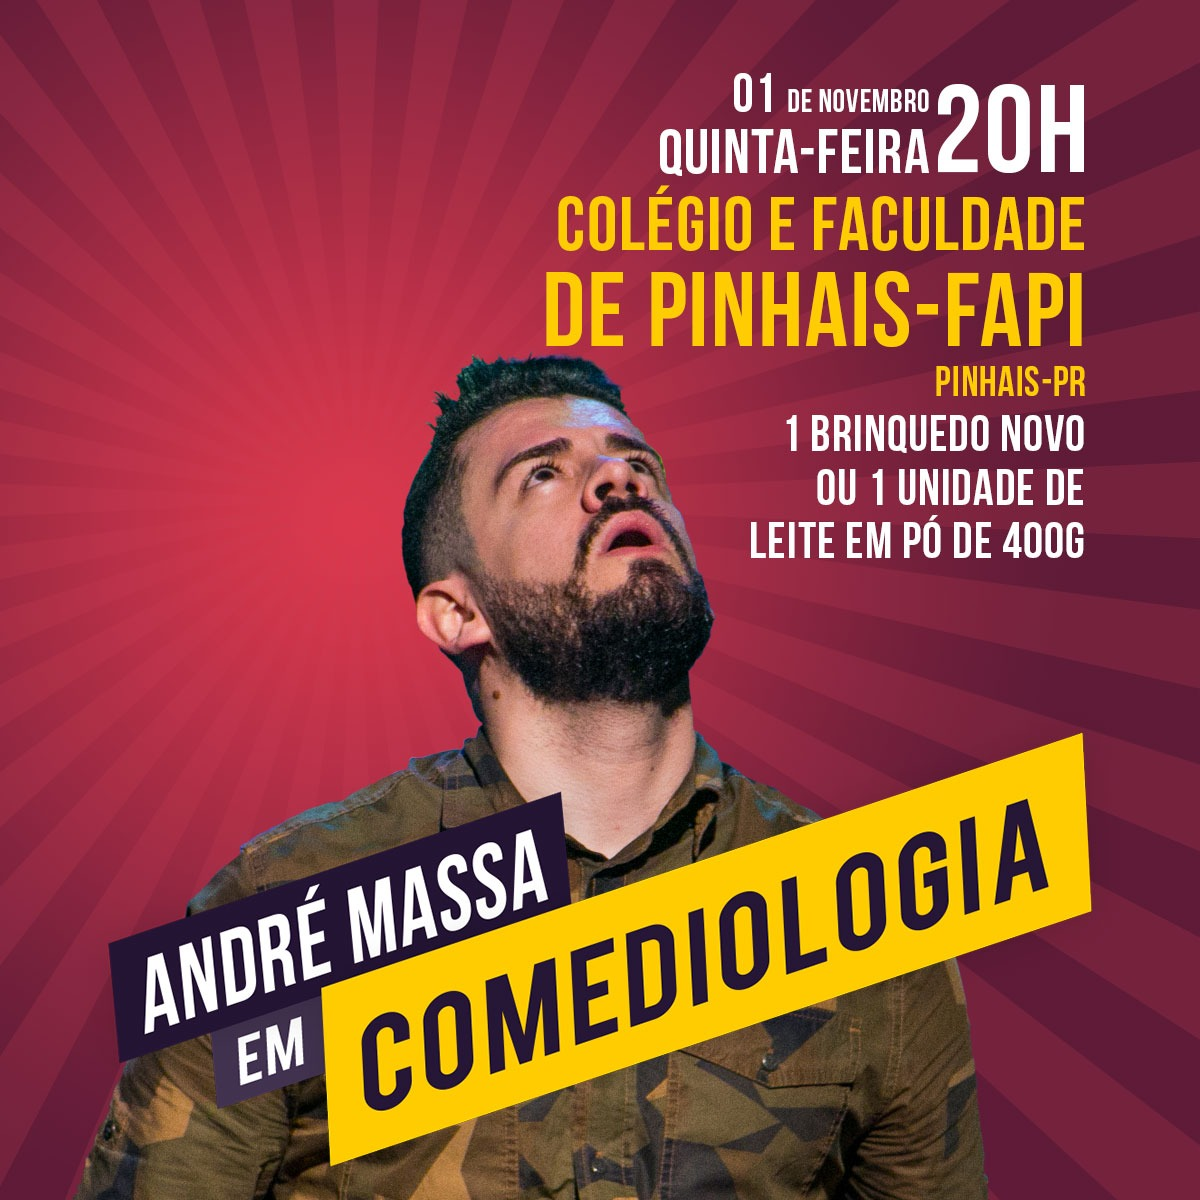 Show André Massa